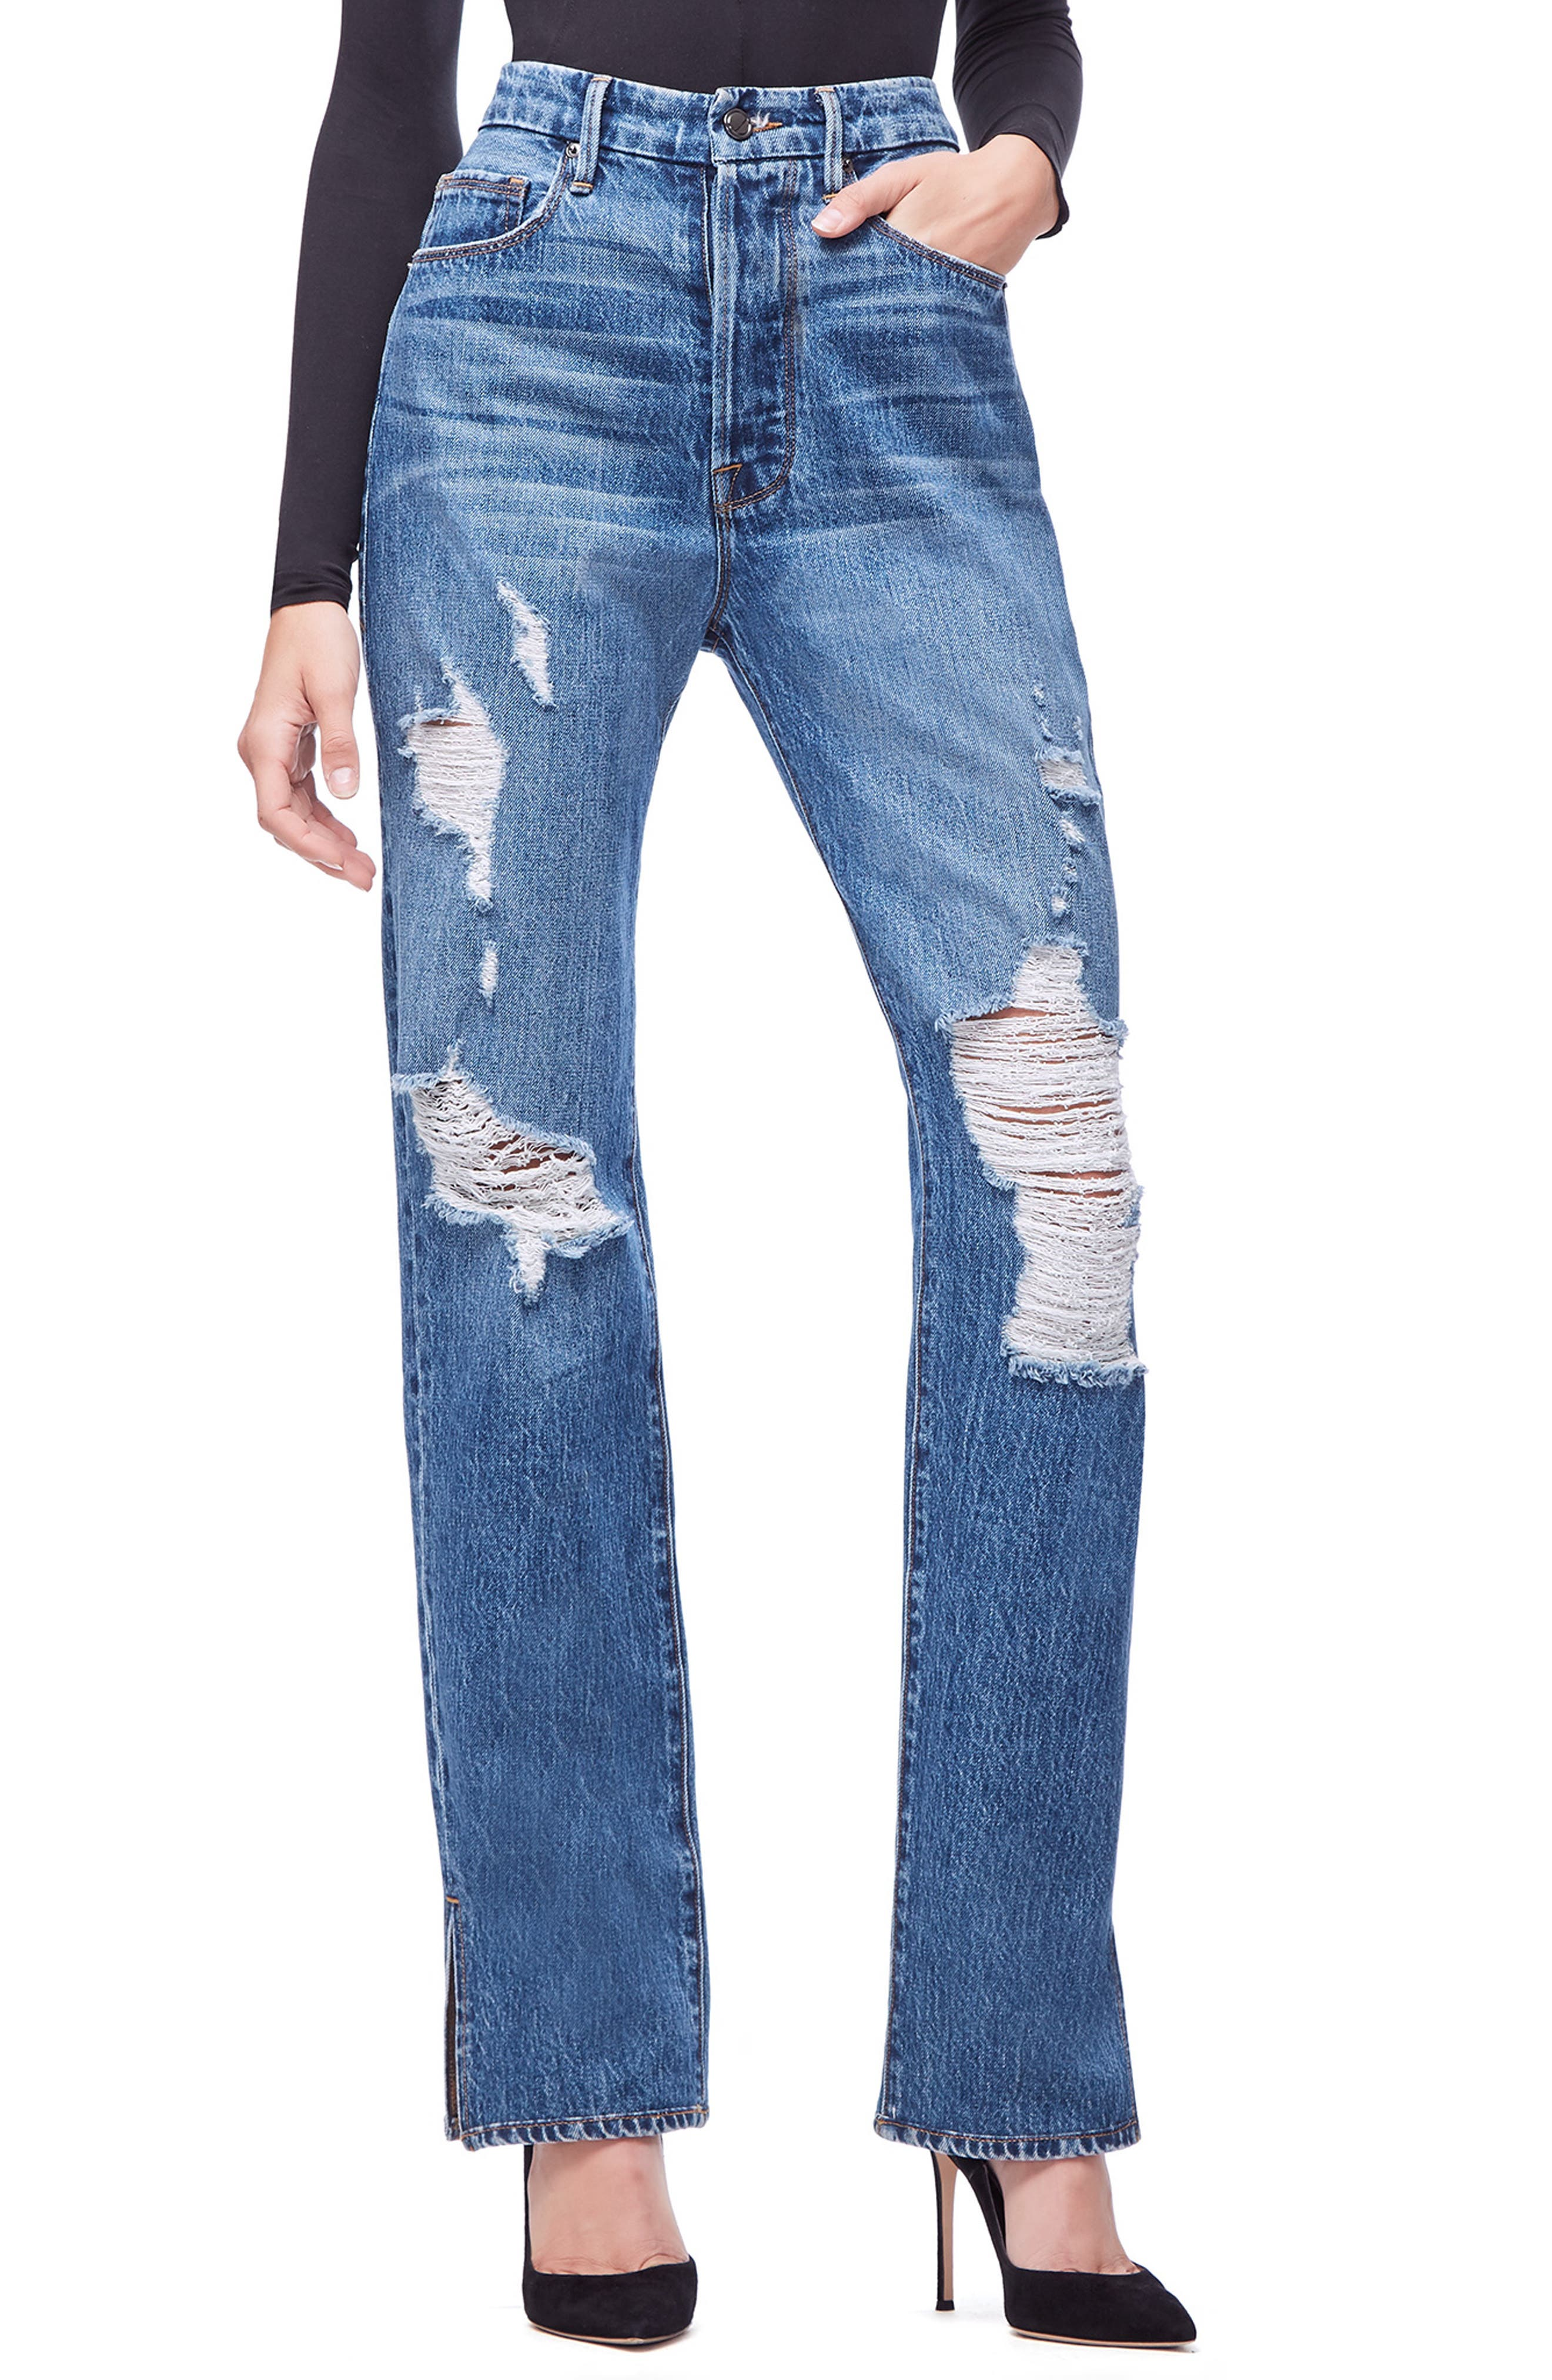 GOOD AMERICAN Good Boy High Rise Ripped Boyfriend Jeans, Main, color, BLUE194